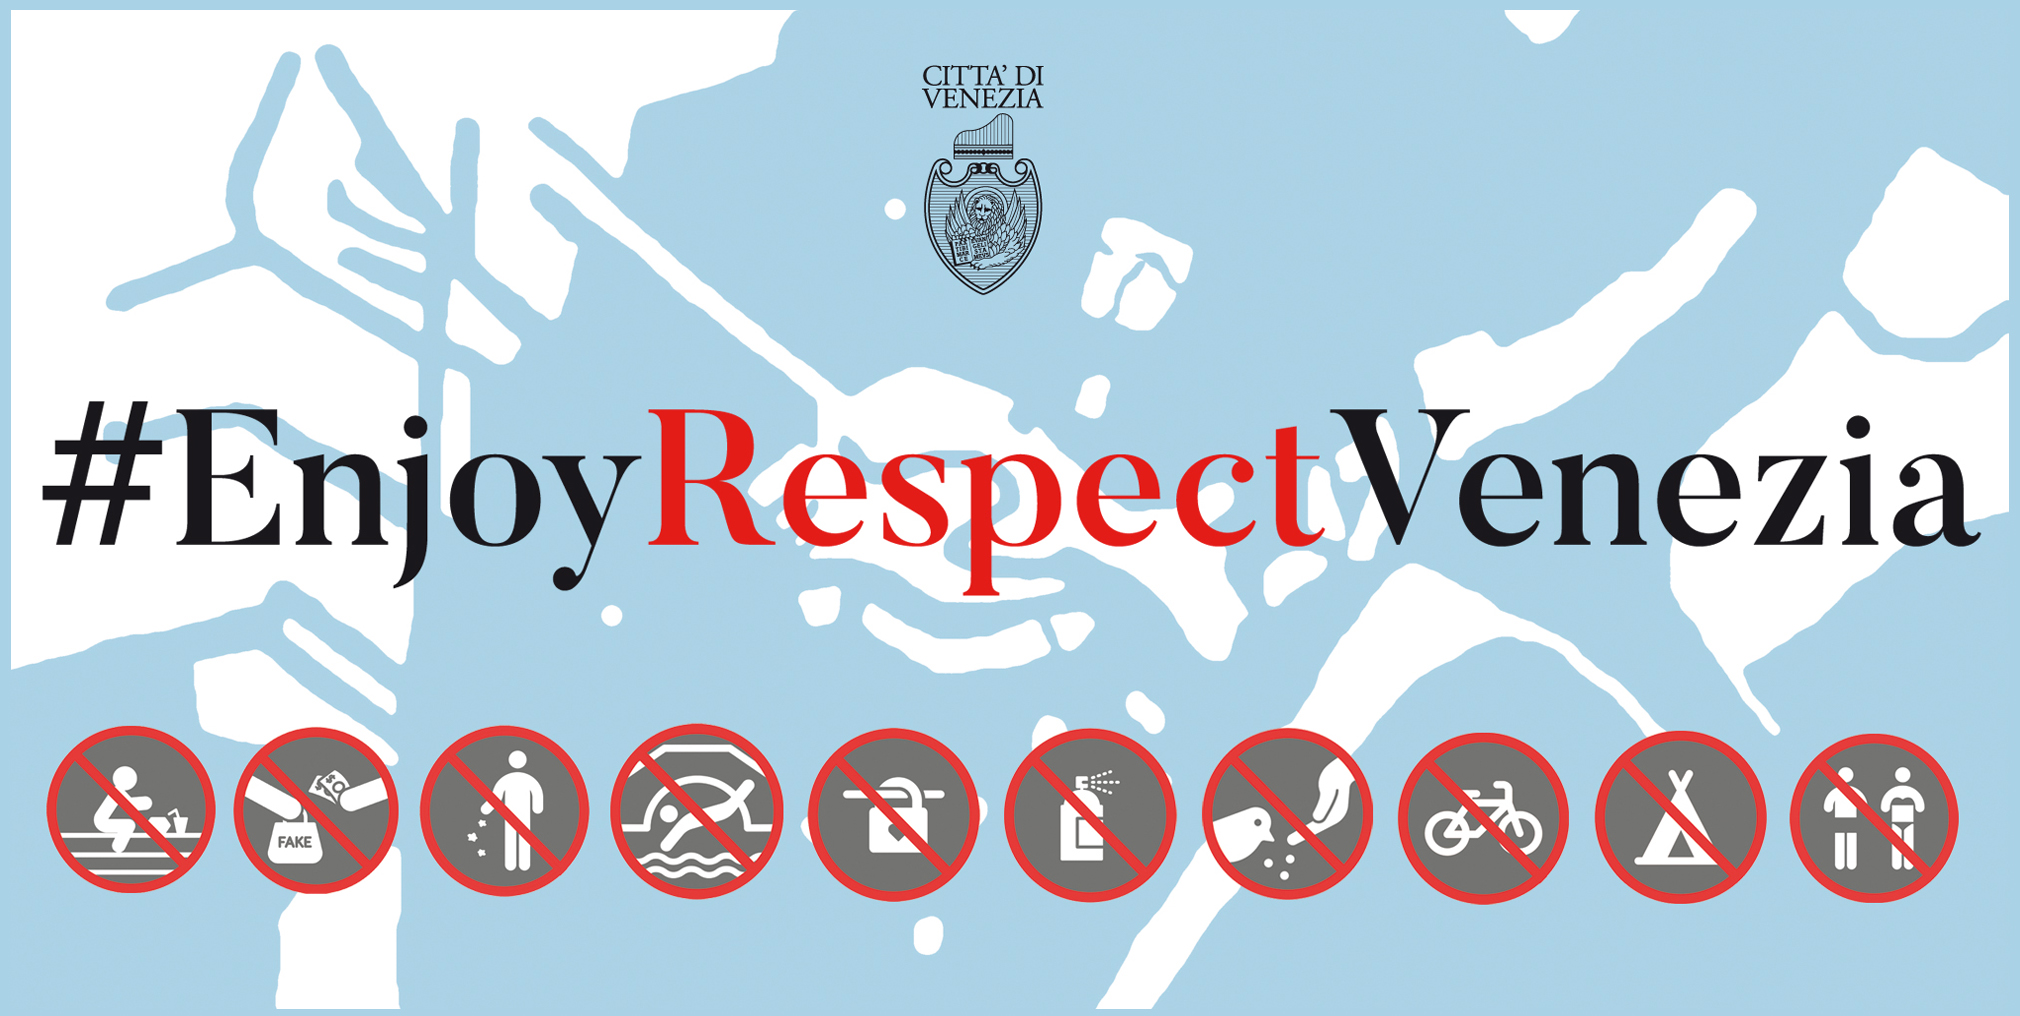 #EnjoyRespectVenezia